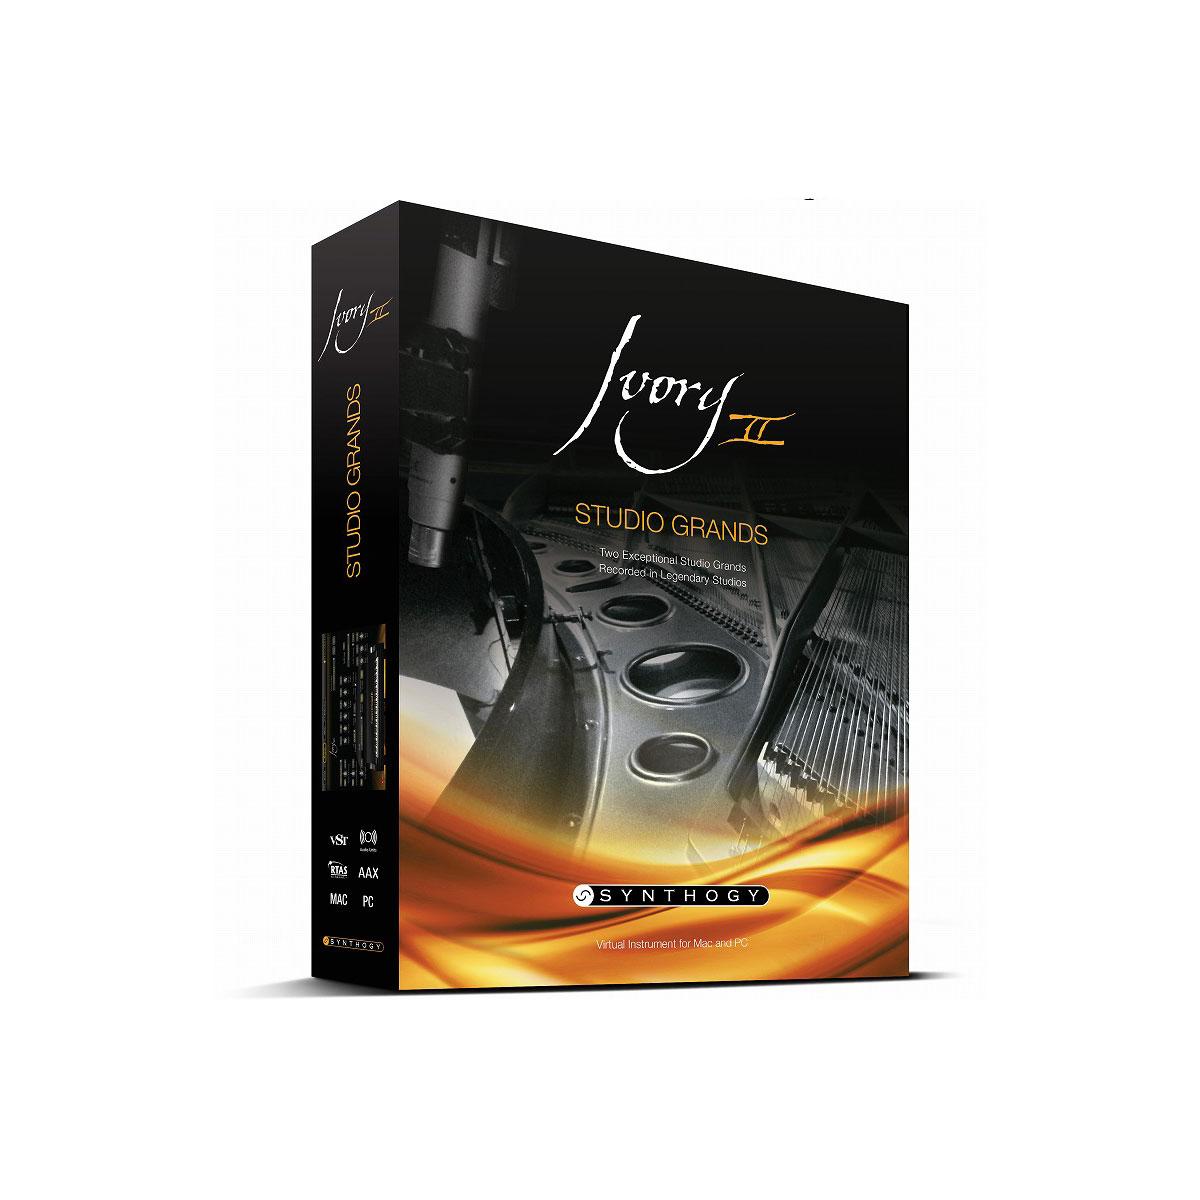 SYNTHOGY シンソジー / Ivory II Studio Grands スタジオグランド(USBインストーラー入りボックス版)【お取り寄せ商品】